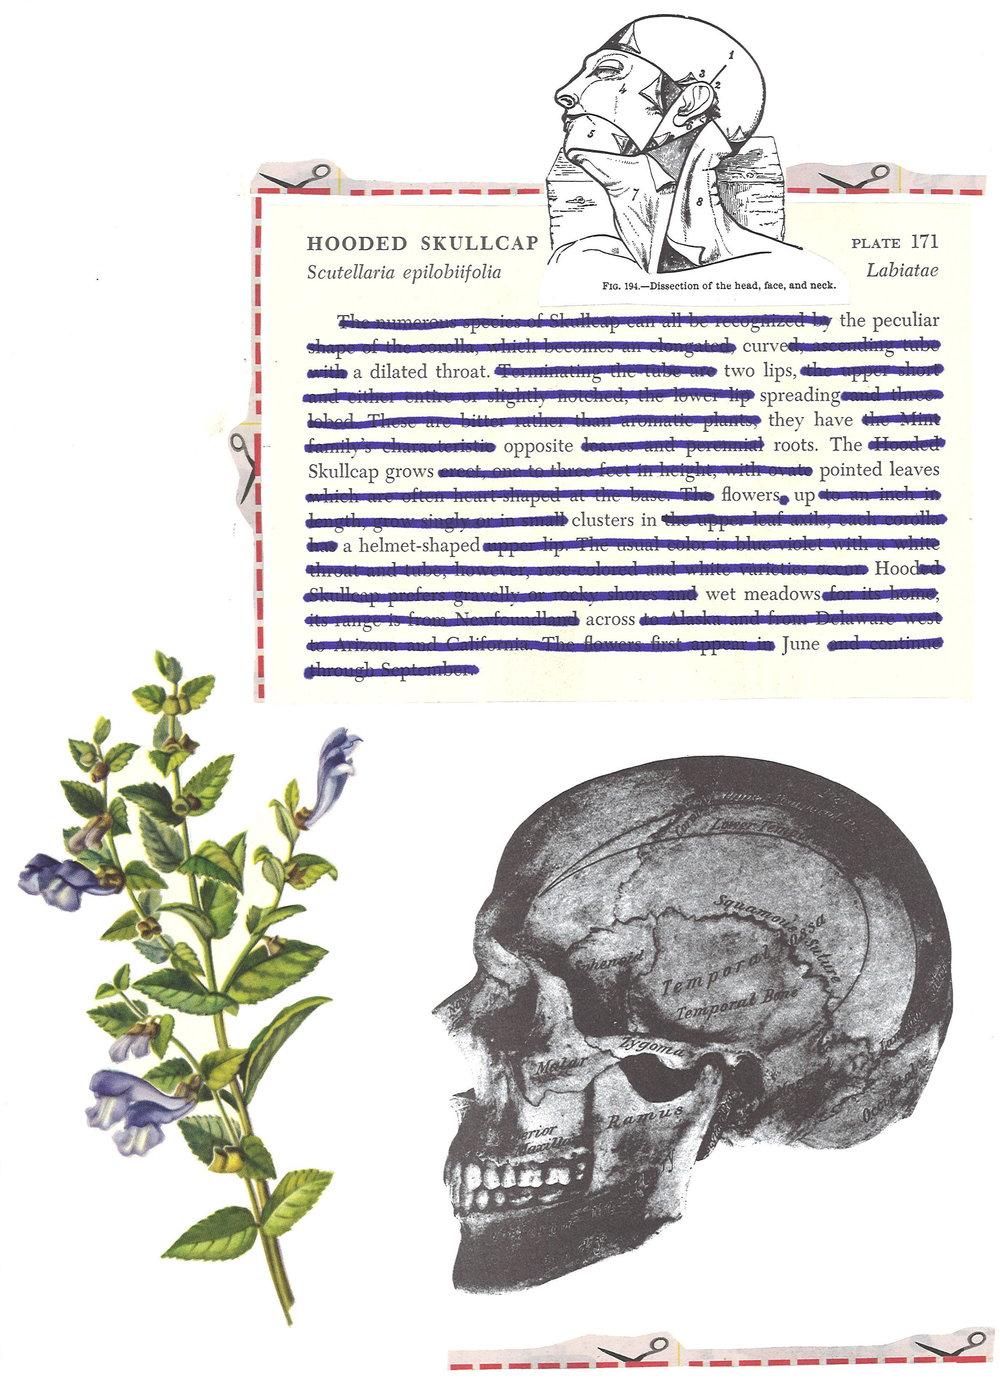 hooded_skullcap_poem-collage.jpg